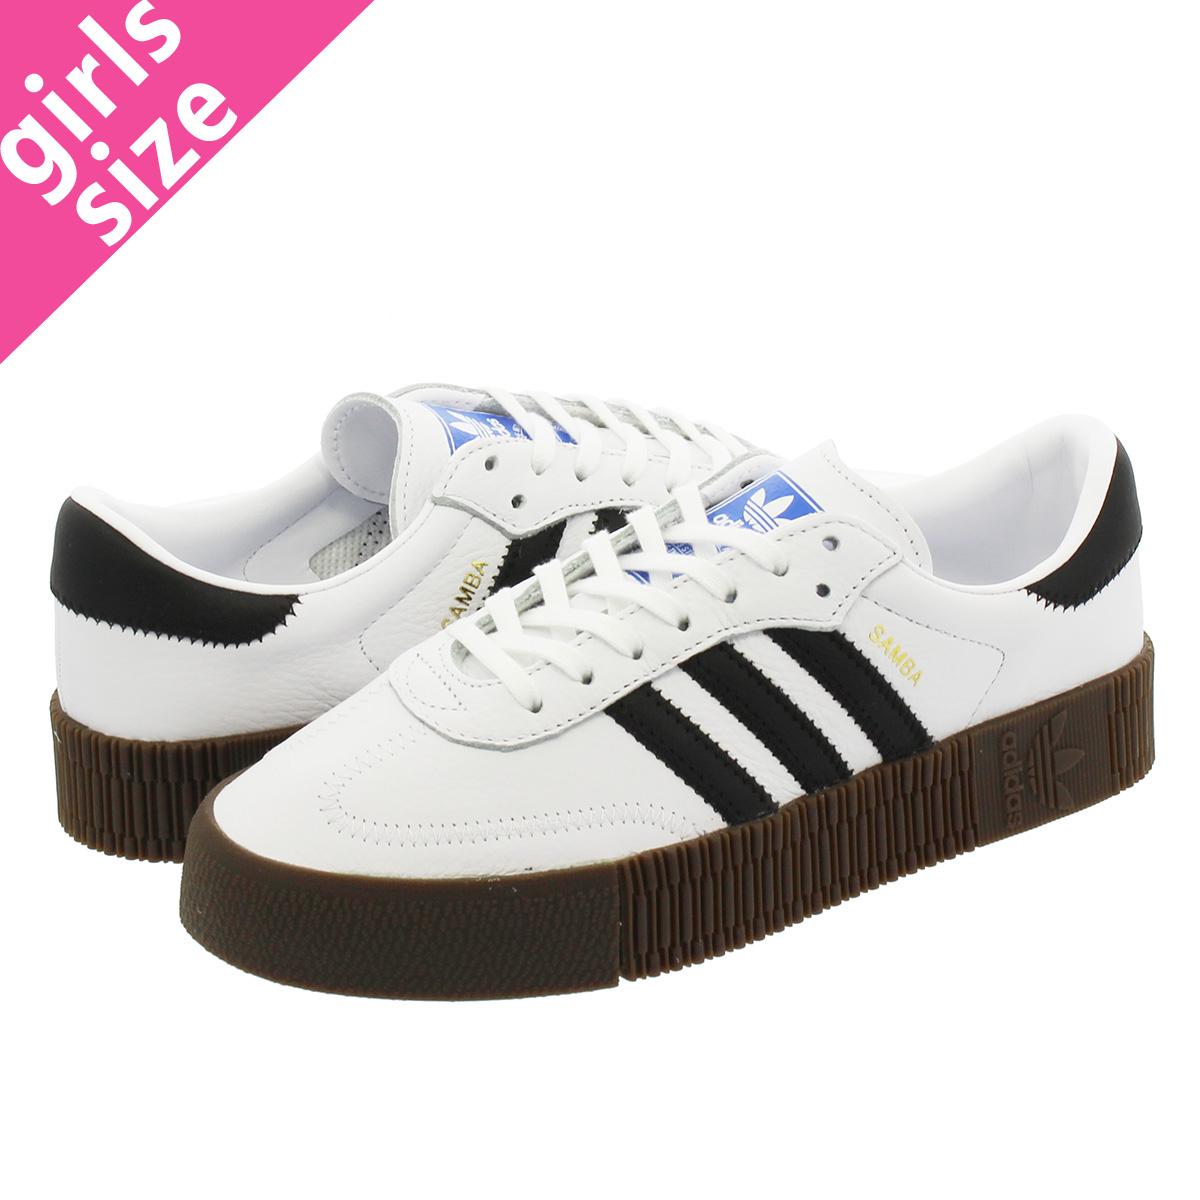 81cd7377464 adidas SAMBAROSE W Adidas samba Rose W RUNNING WHITE CORE BLACK GUM